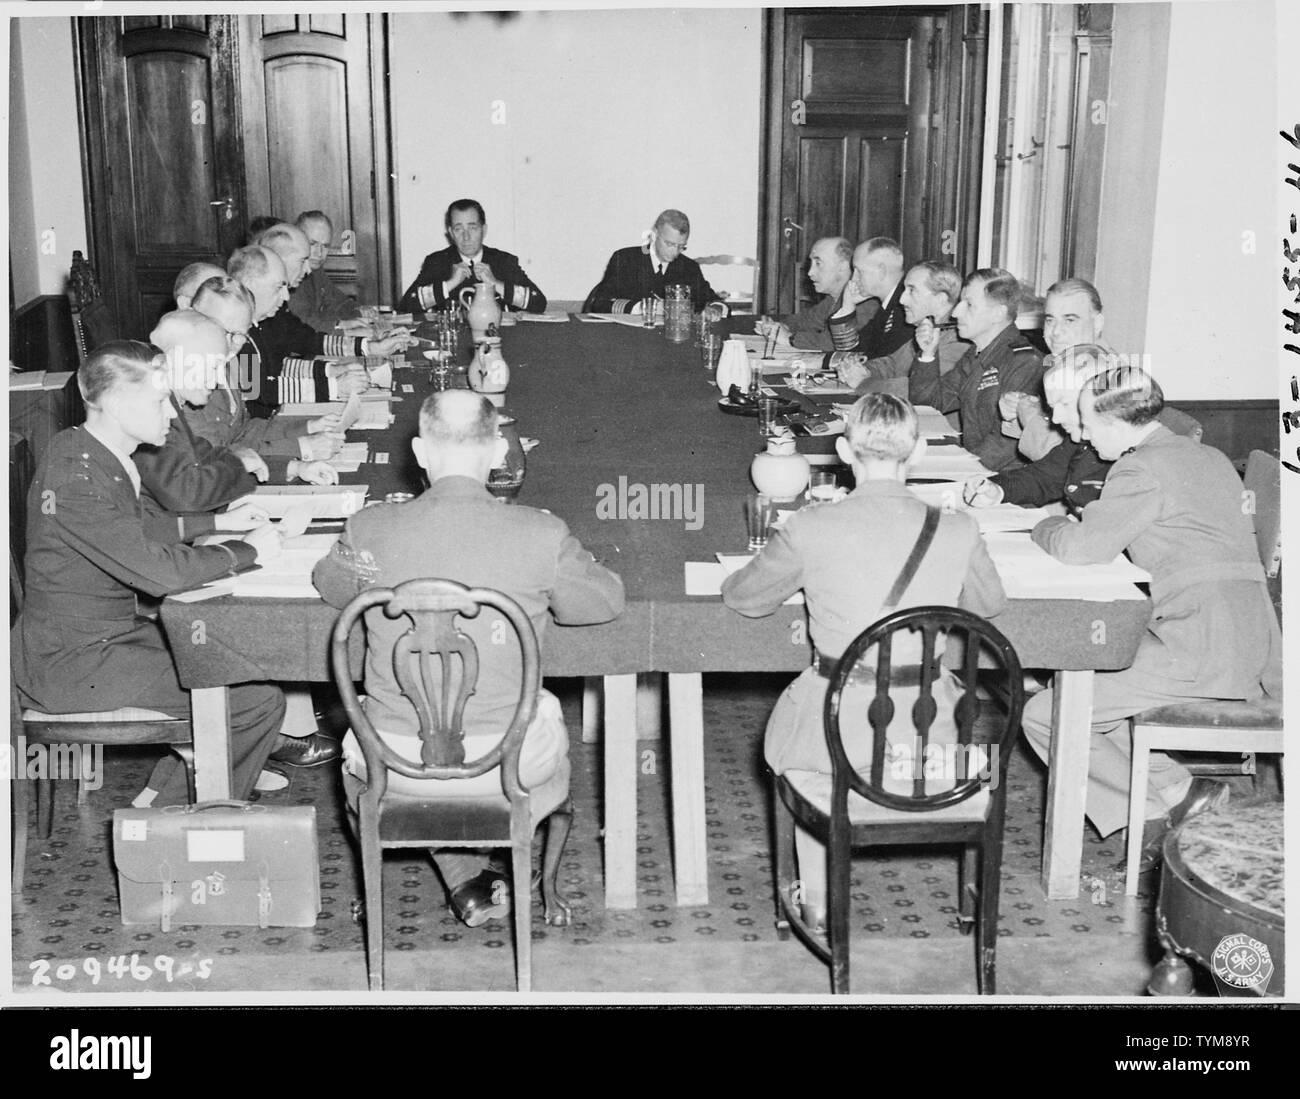 The Combined Chiefs of Staff meet on the 4th day of the Potsdam Conference in Germany. Clockwise, L to R: Maj. Gen. Lauris Norstad, Gen. Henry H. Arnold, Gen. George C. Marshall, Brig. Gen. Andrew J. McFarland, Adm. William D. Leahy, Adm. Ernest J. King, Vice-Adm. C. M. Cooke, Jr., Gen. Brehon B. Somervell, Rear Adm. H. A. Flanigan, Captain C. J. Moore, Lt. Gen. Sir Gordon McCready, Adm. Sir Andrew Cunningham, Field Marshall Sir Alan Brooke, Marshall Sir Charles Portal, Gen. Sir Hastings Ismay, Gen. L. C. Hollisd, Brig. A. T. Cornwall-Jones, Col. Thomas Haddon, and Lt. Gen. John E. Hull. - Stock Image